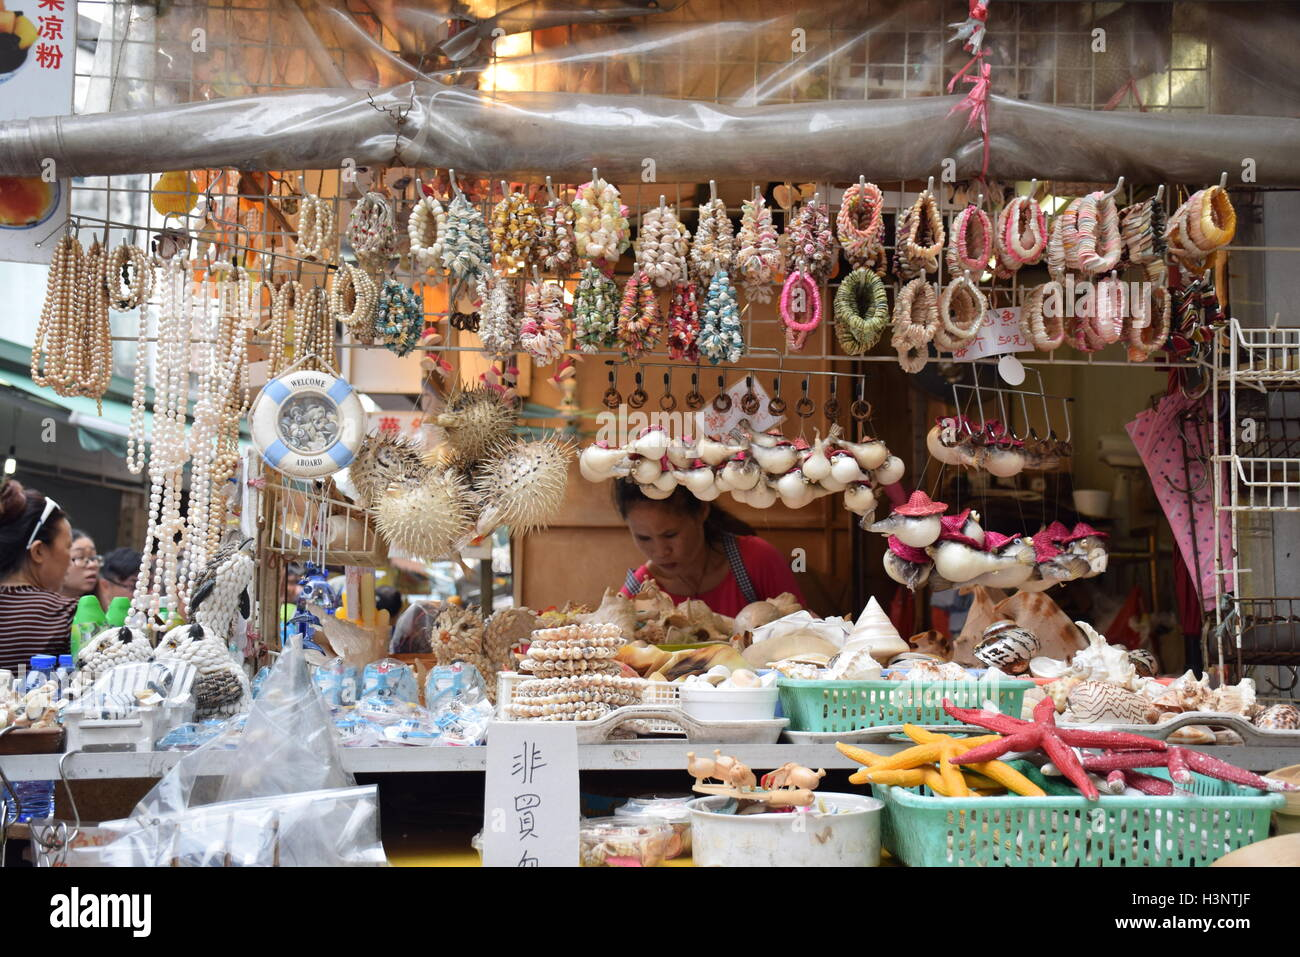 Souvenir shop in Tai O fishing village, Lantau island, Hong Kong S.A.R. - Stock Image